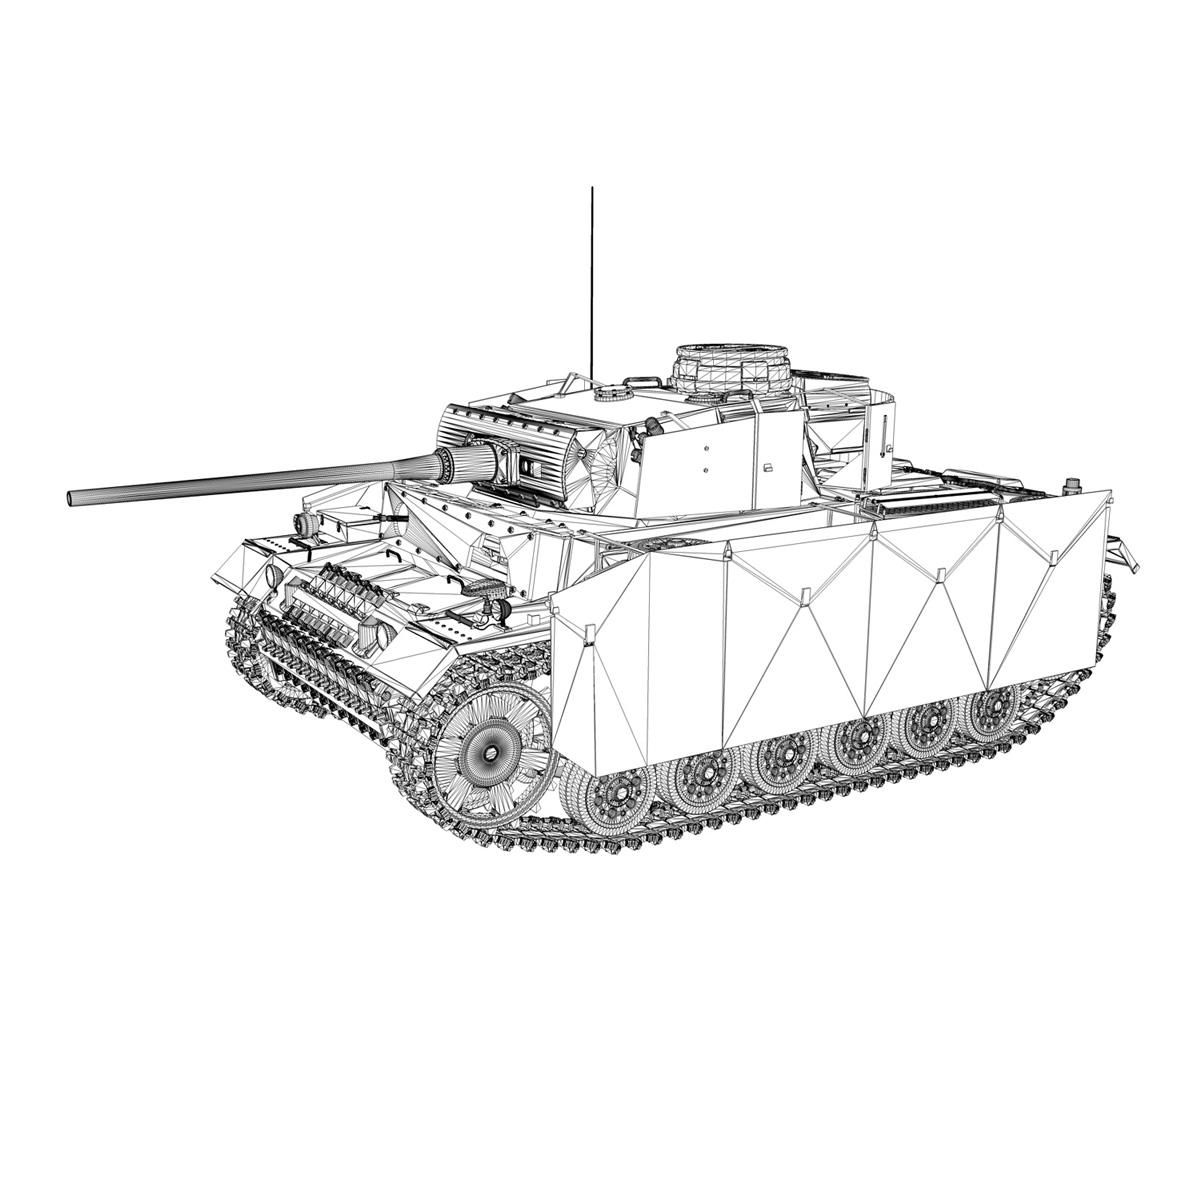 pzkpfw iii – panzer 3 – ausf.m – 413 3d model 3ds c4d lwo obj 269377